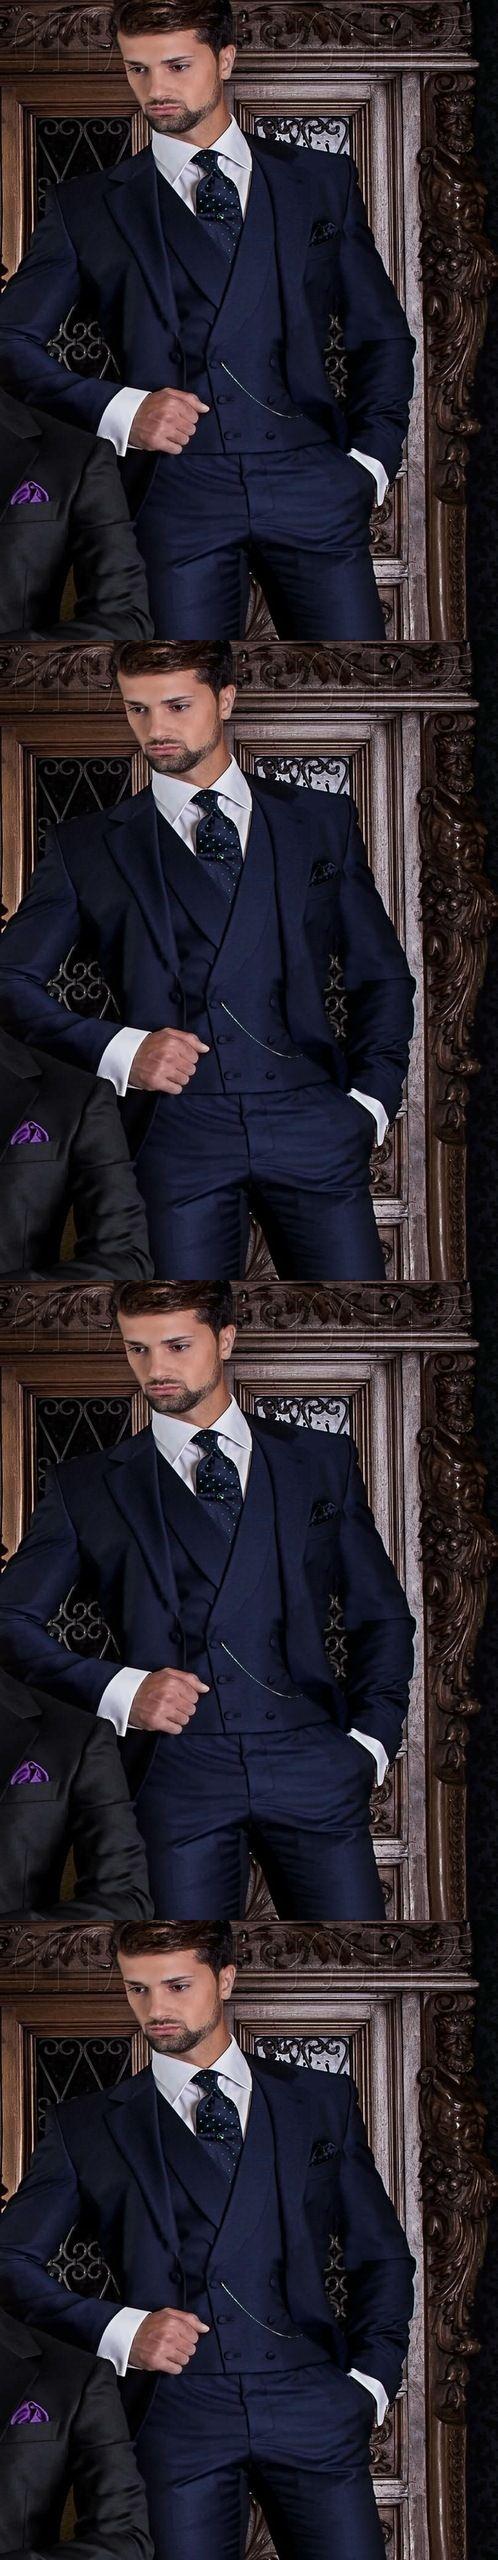 2017 Elegant One Button Navy Blue Groom Tuxedos Groomsmen Men's Wedding Prom Suits Bridegroom Wear Suits (Jacket+Pants+Vest+Tie)